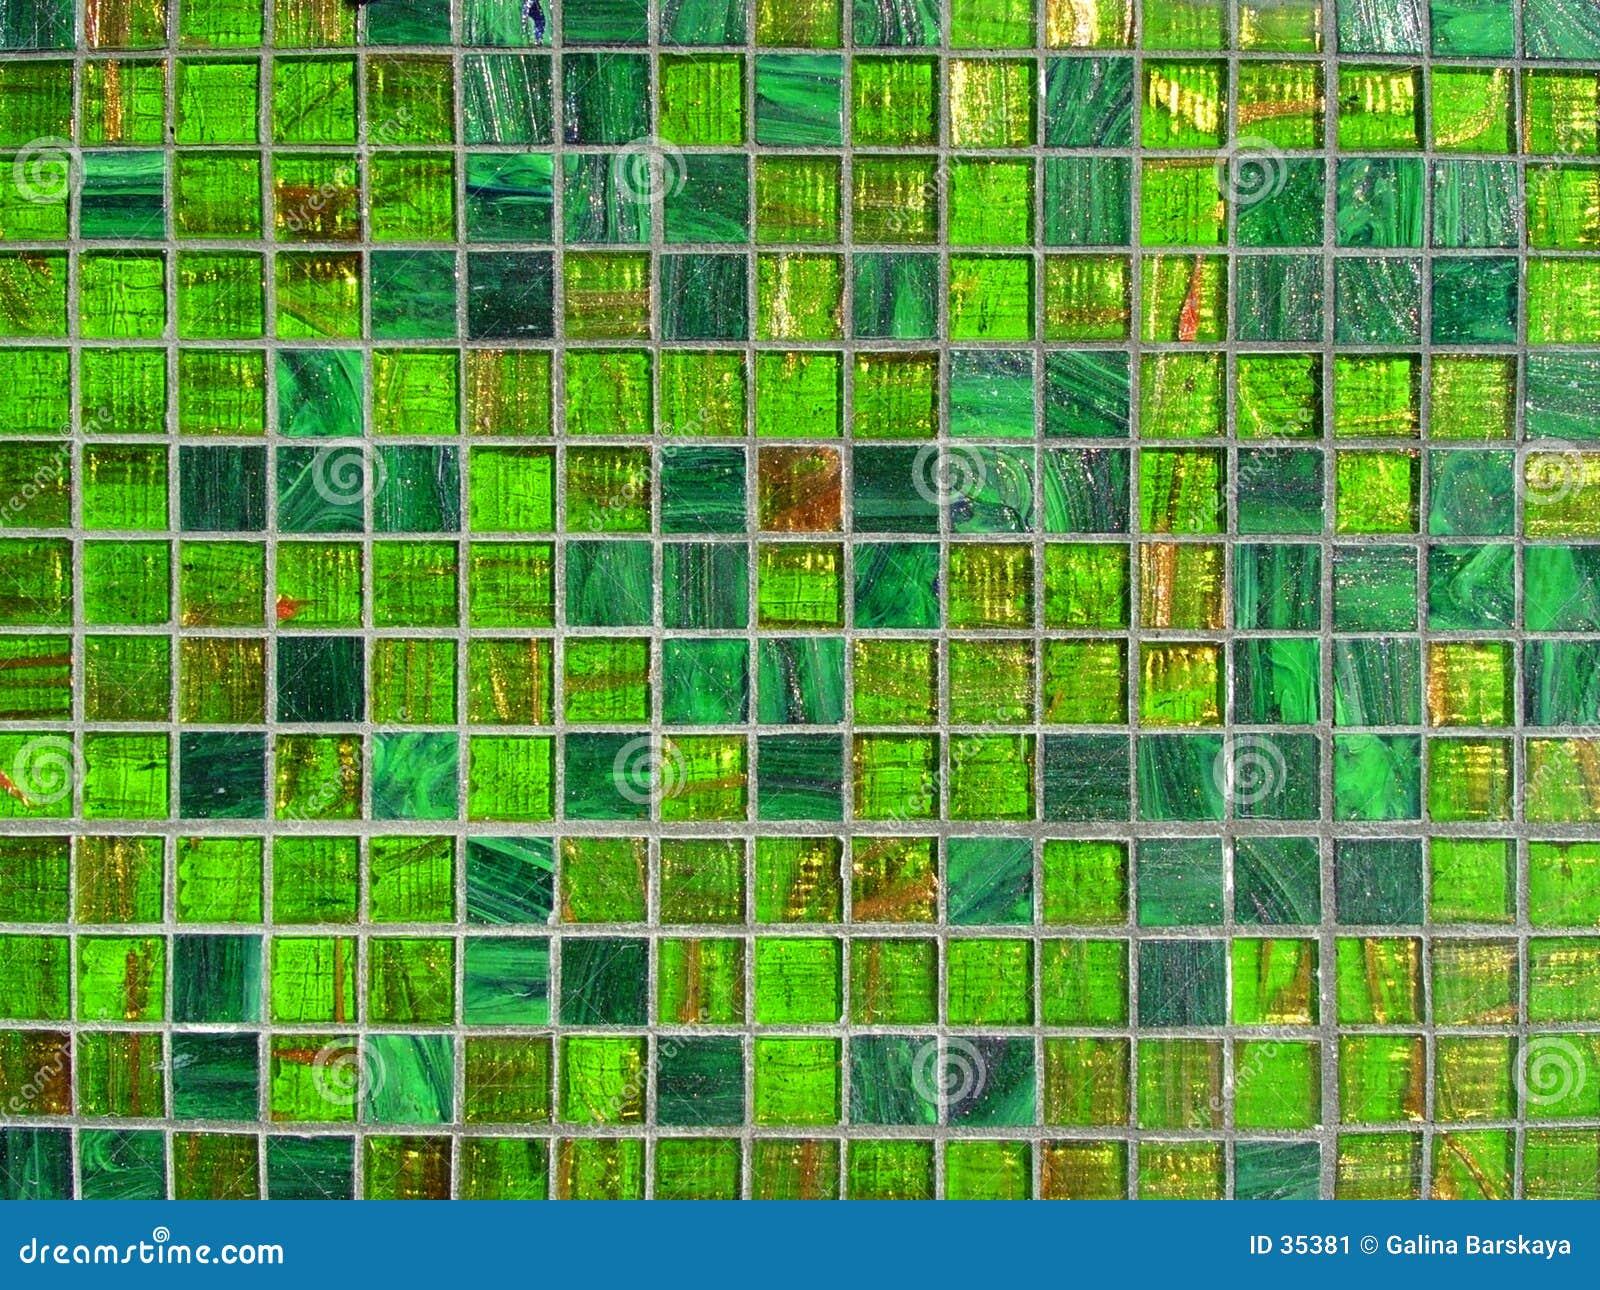 Download Fondo verde del azulejo imagen de archivo. Imagen de material - 35381